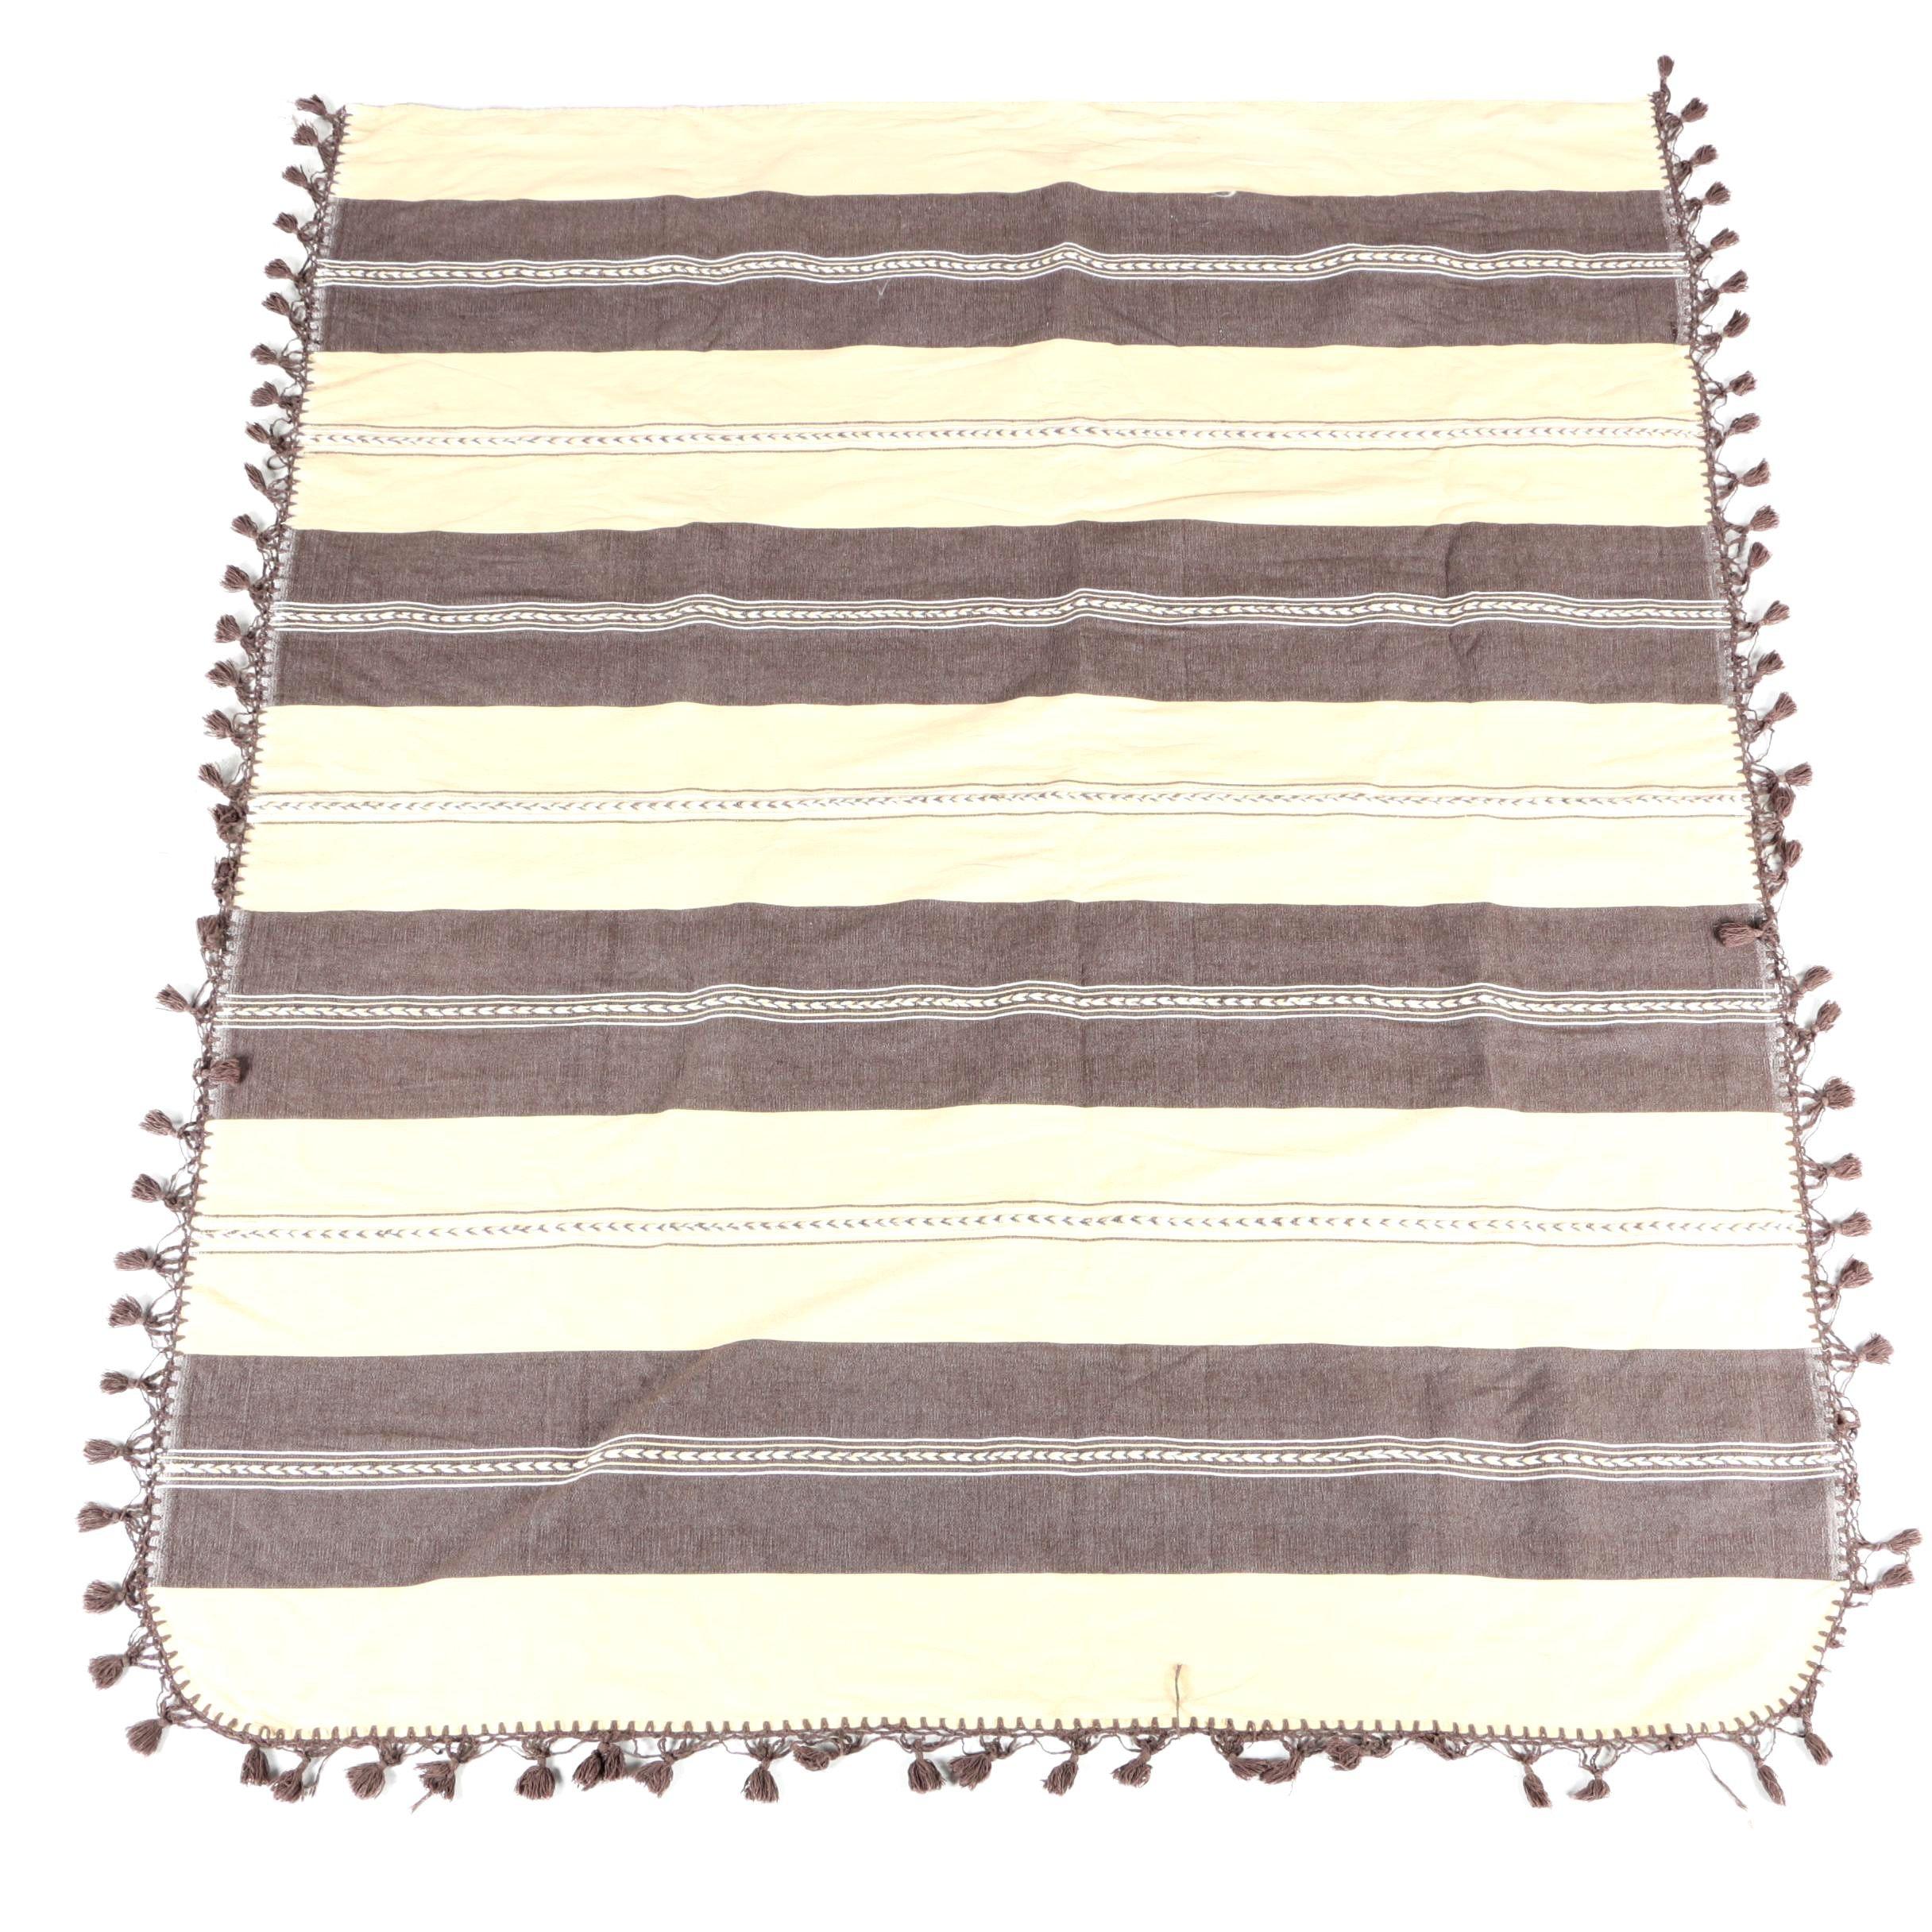 Vintage Southwestern Style Blanket